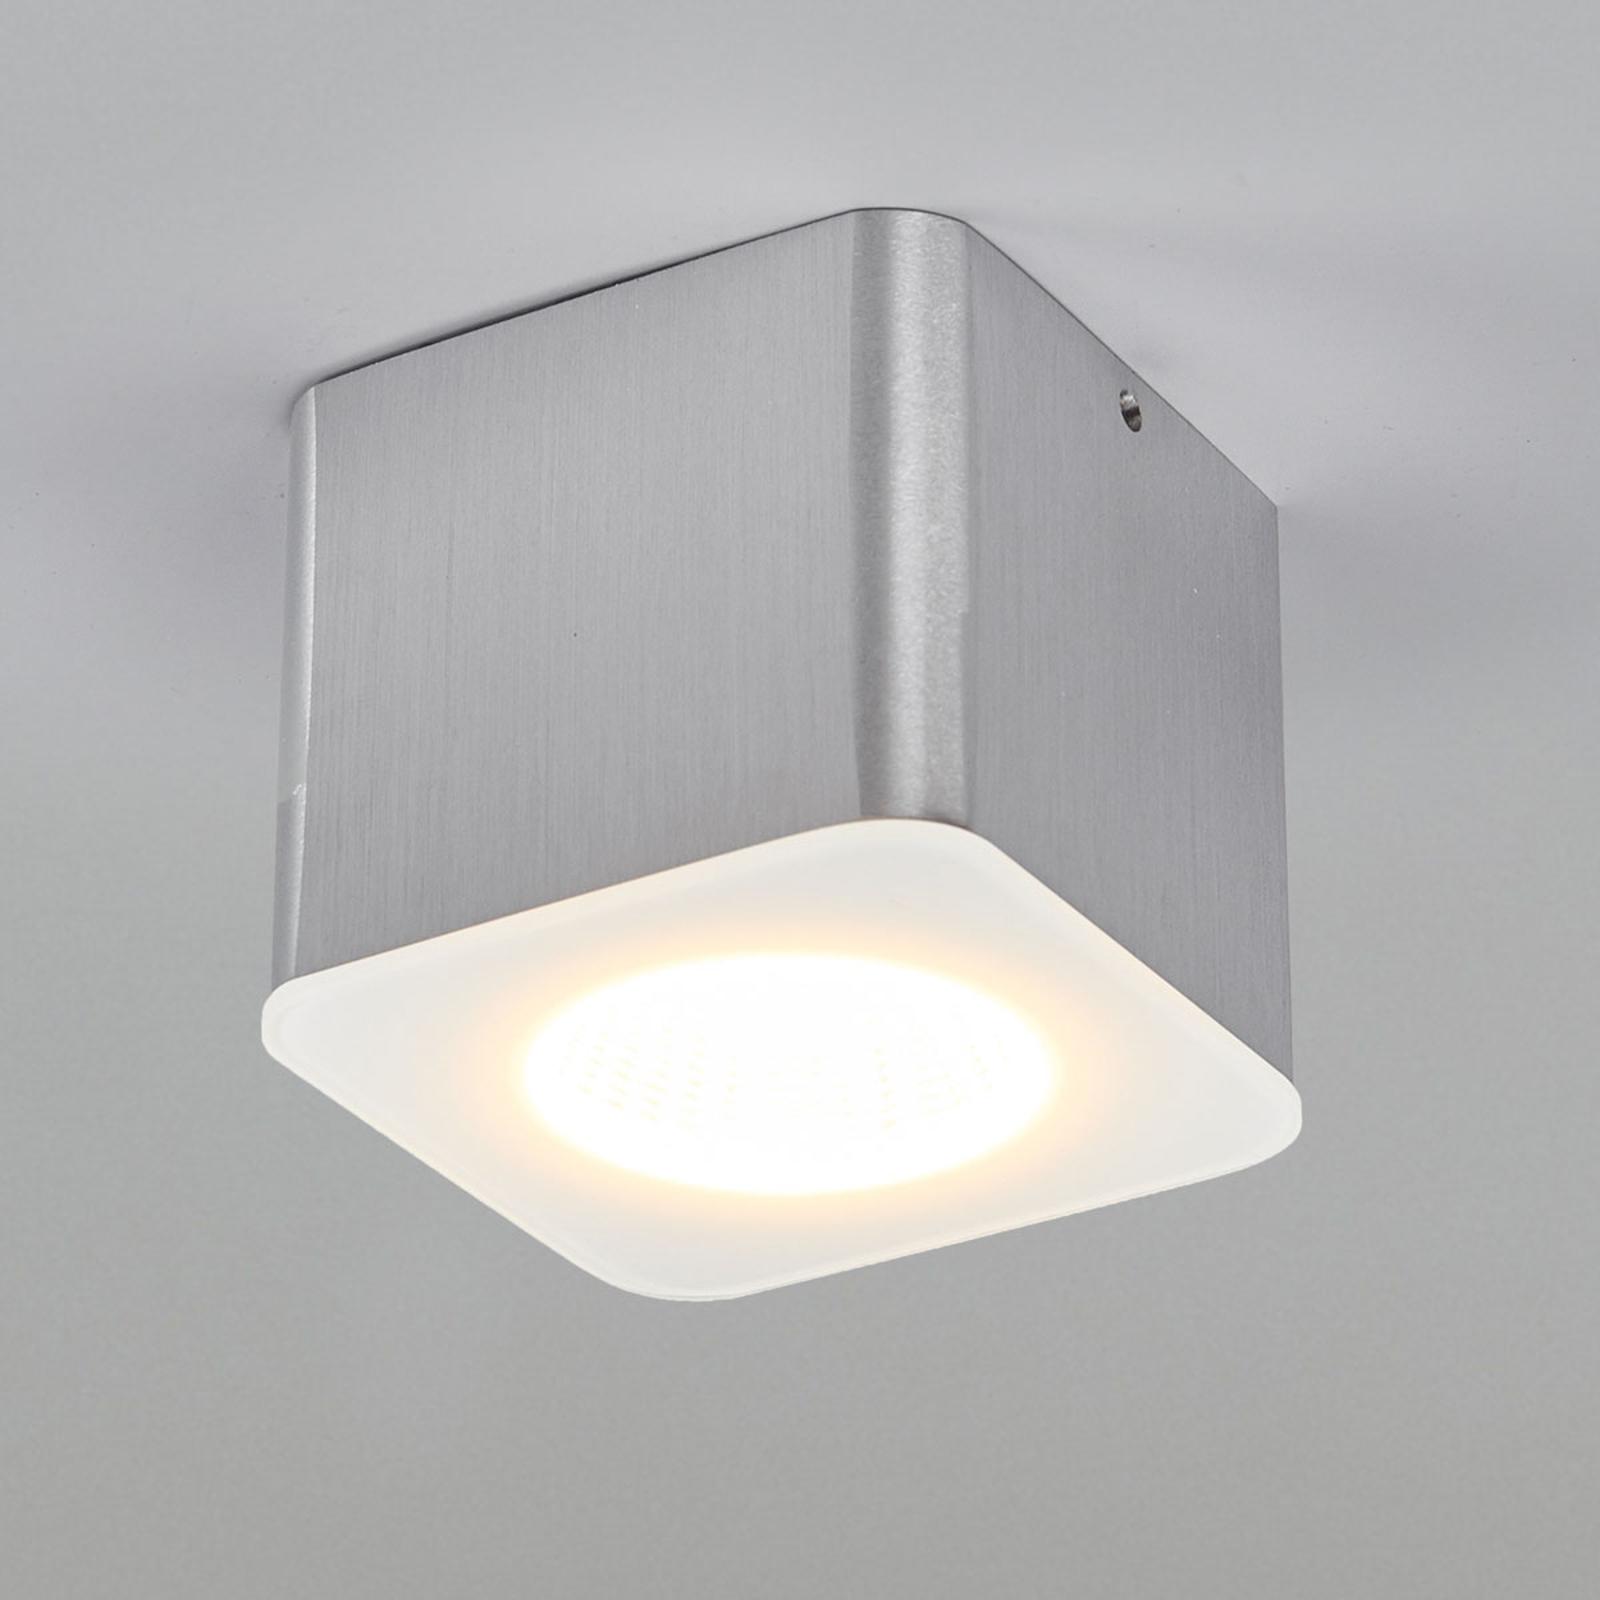 Helestra Oso spot LED angolare alluminio satinato